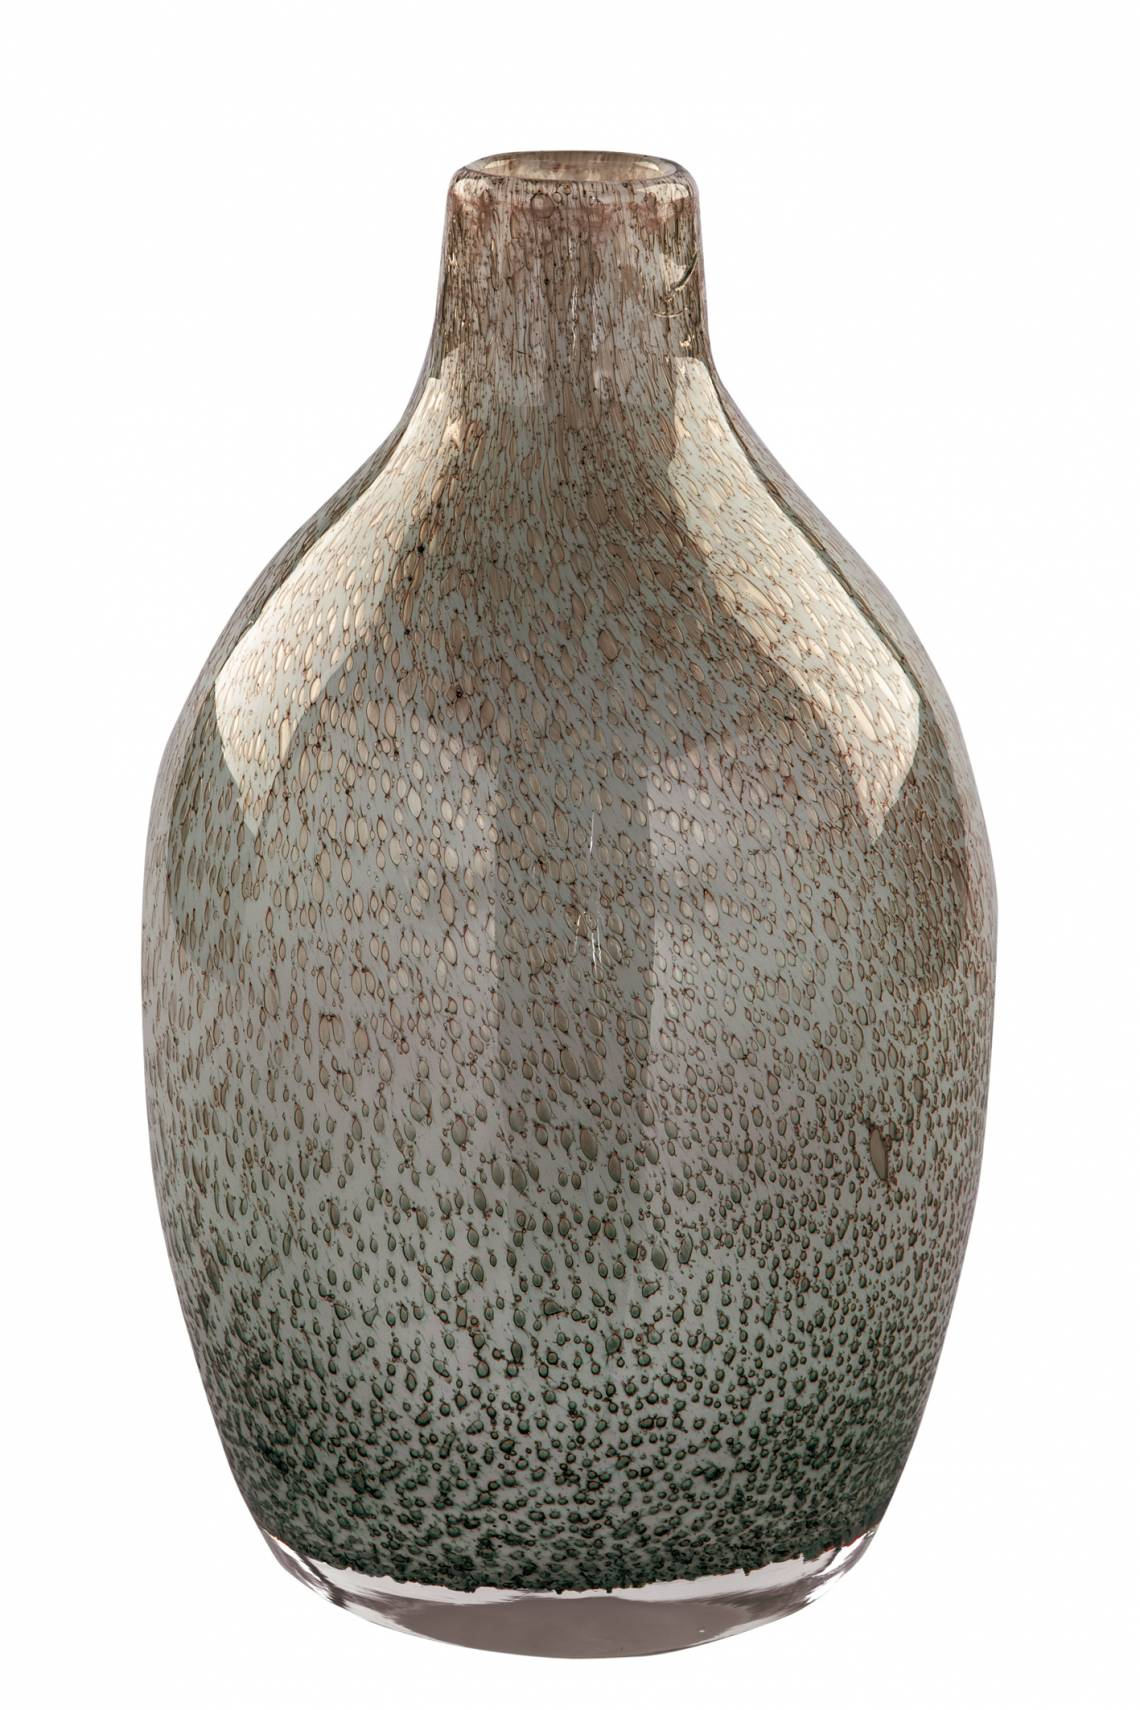 Fink Living SILVA / Glasvase, mundgeblasen, grau 115118